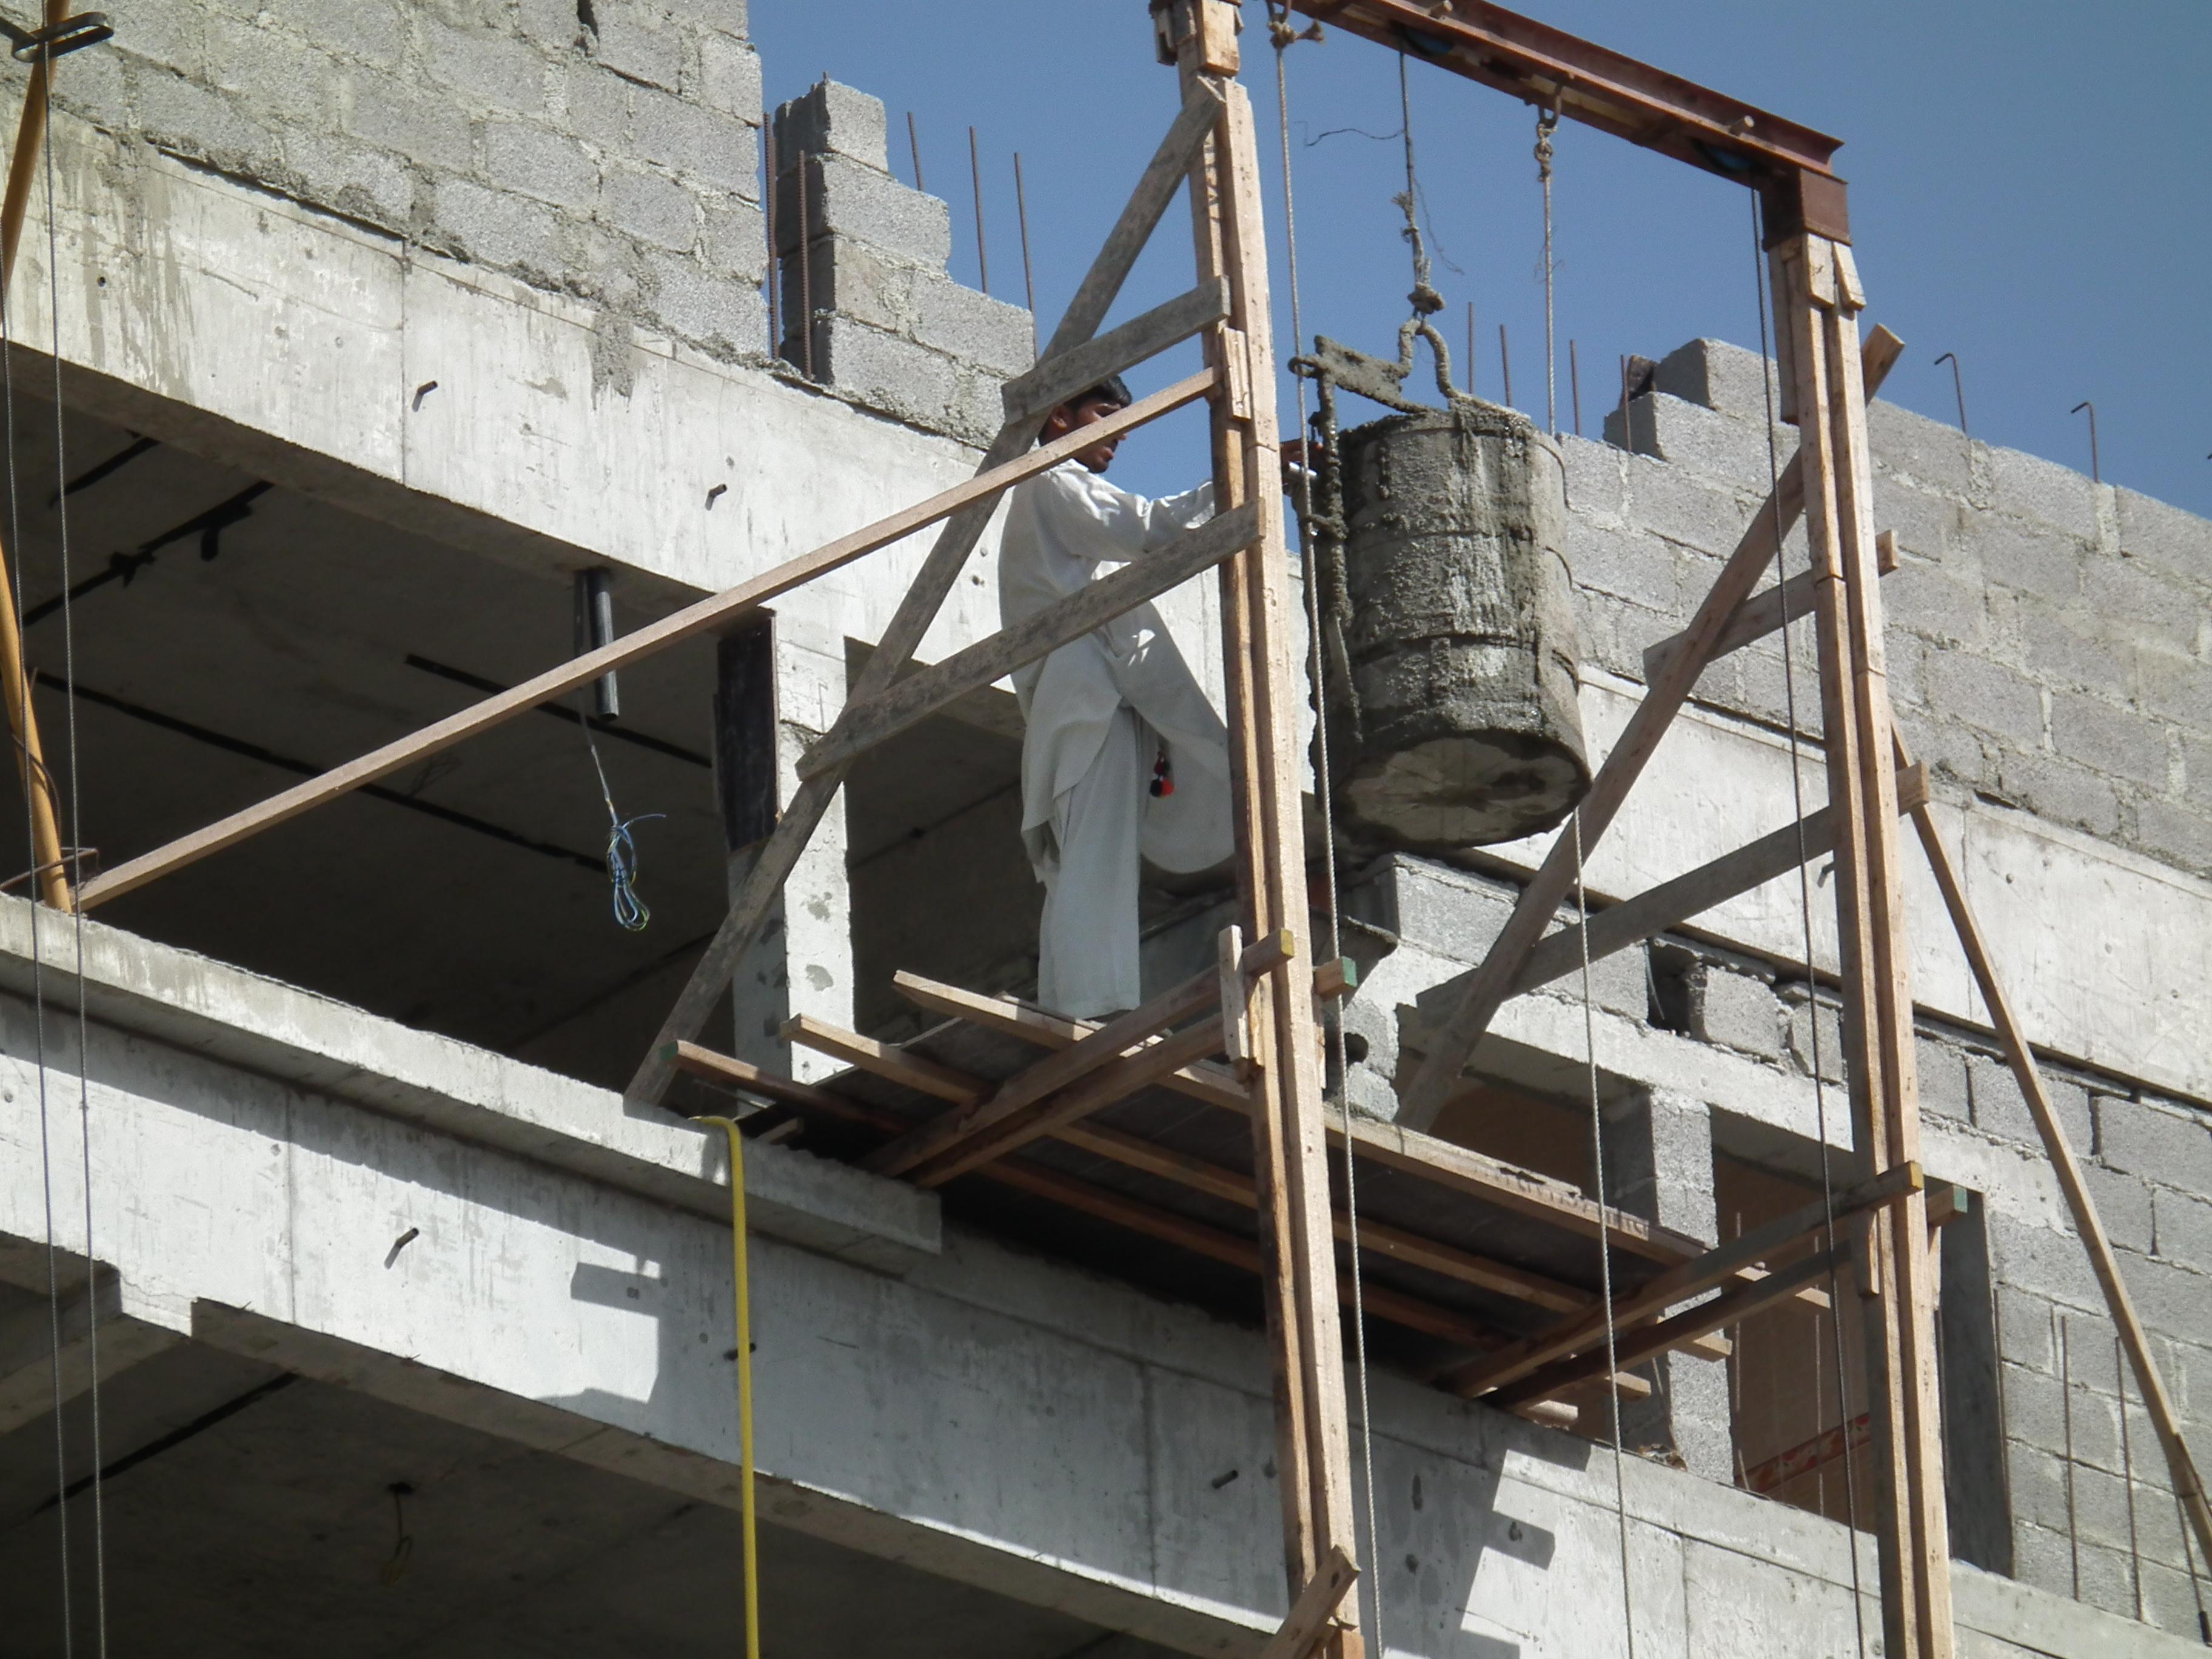 Oman_construction_worker_Fanack